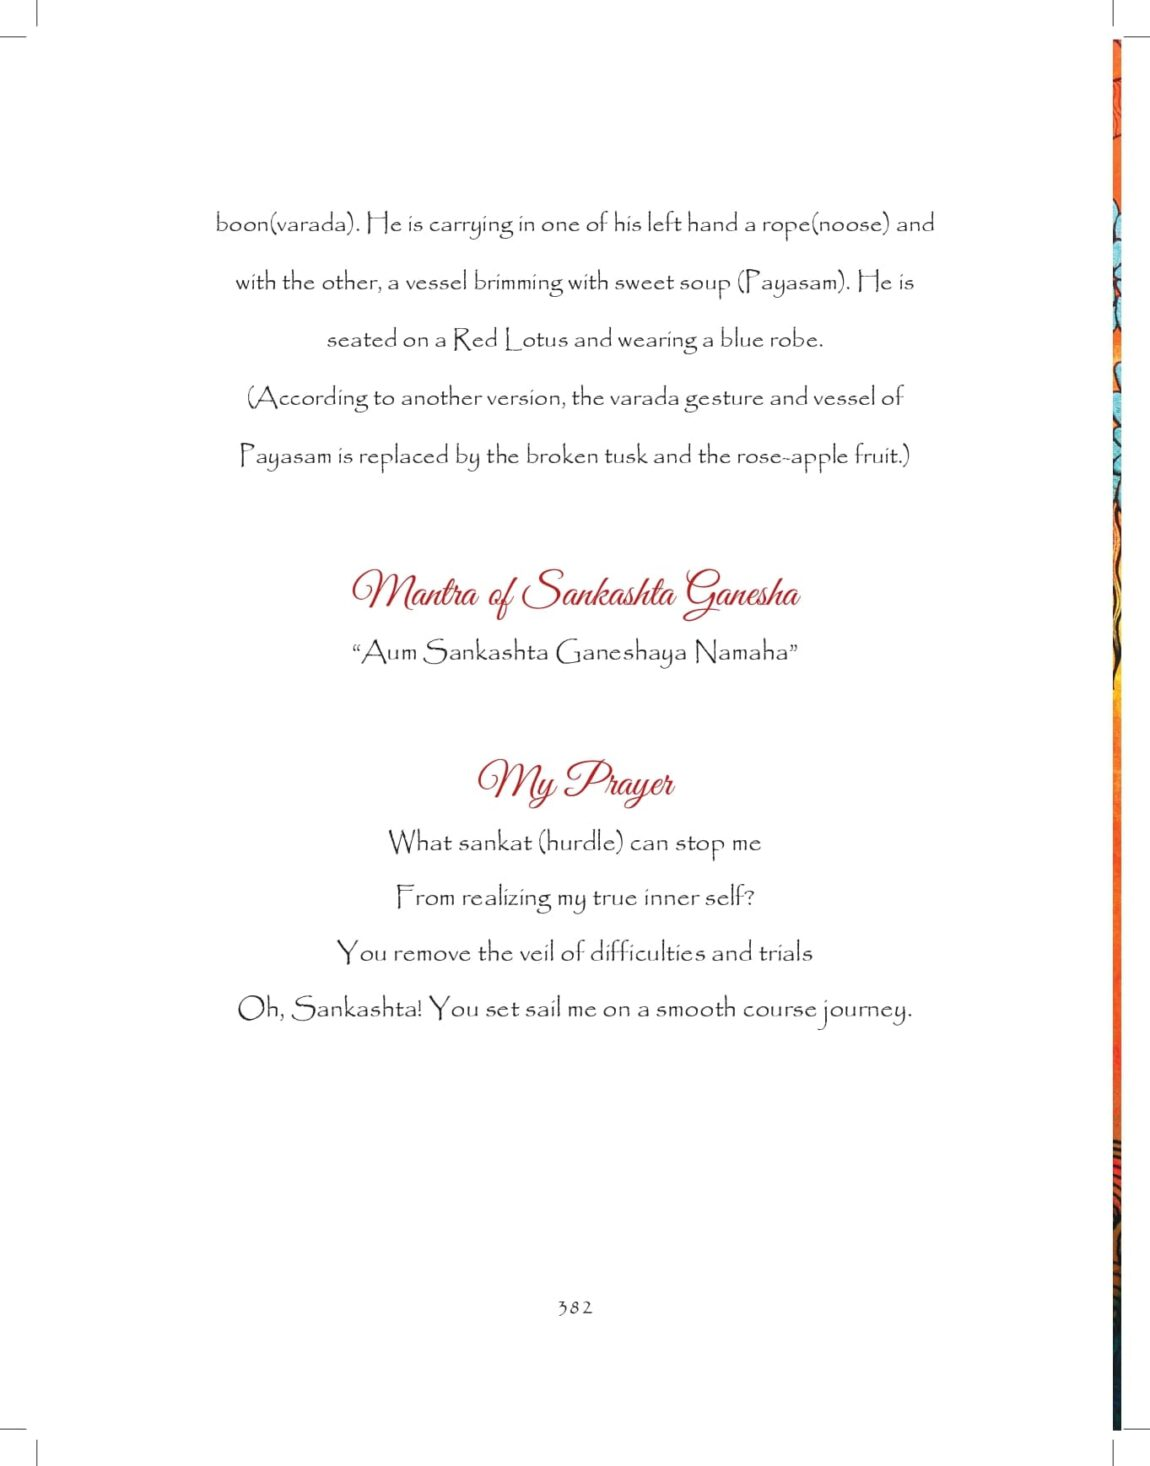 Ganesh-print_pages-to-jpg-0382.jpg